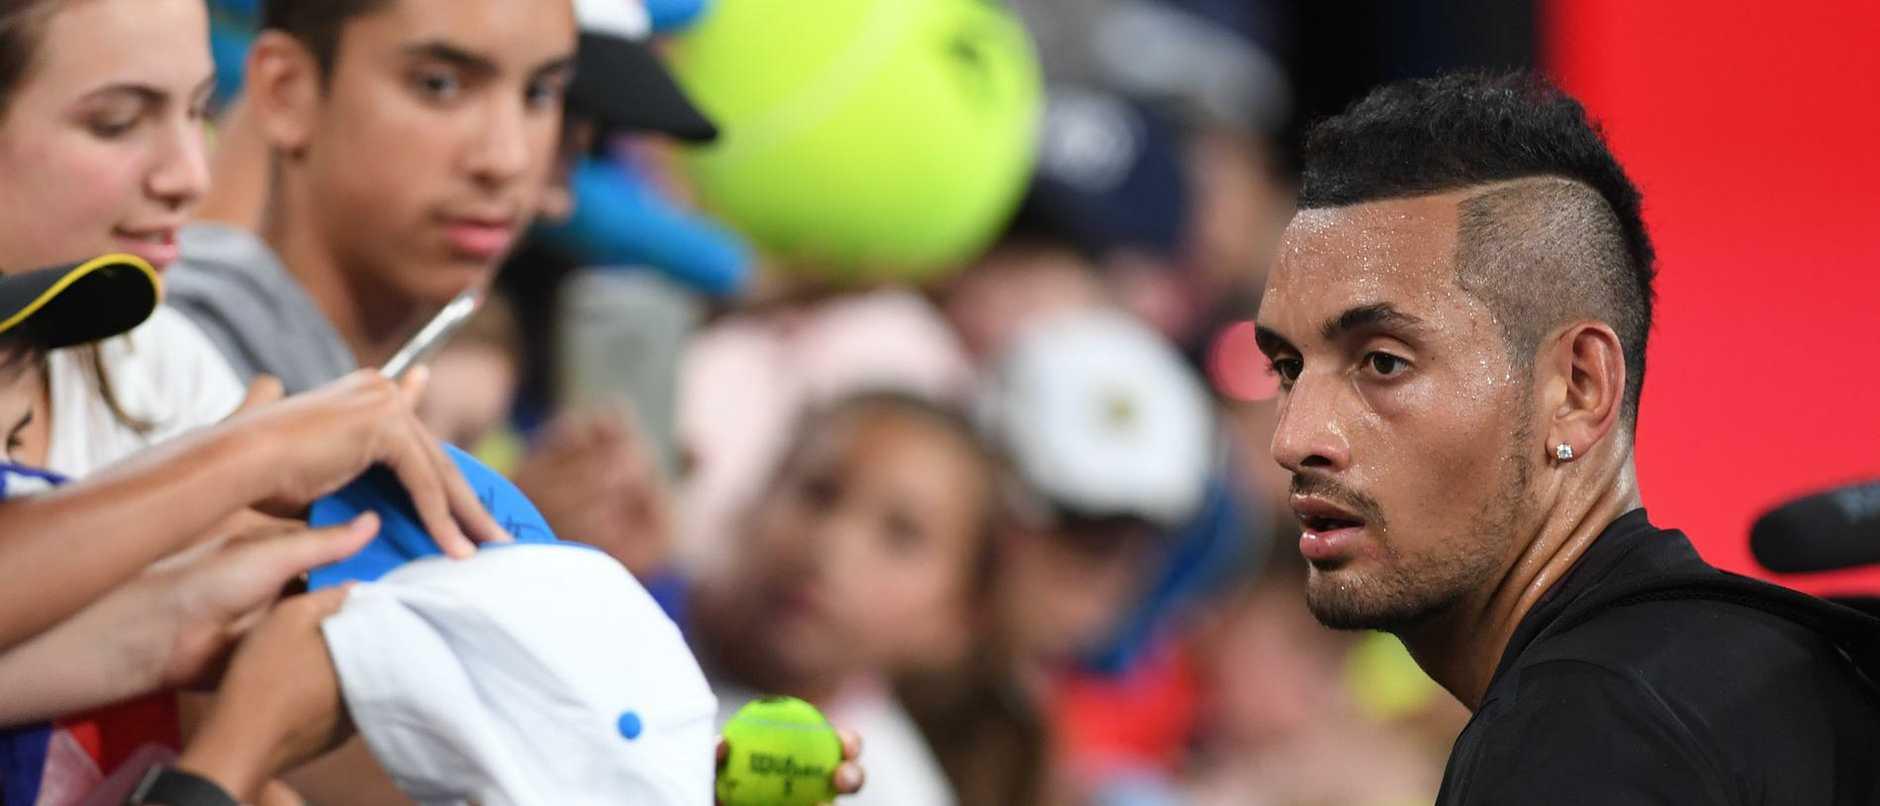 It's no secret what Nick Kyrgios thinks of Novak Djokovic. Picture: AAP Image/Julian Smith